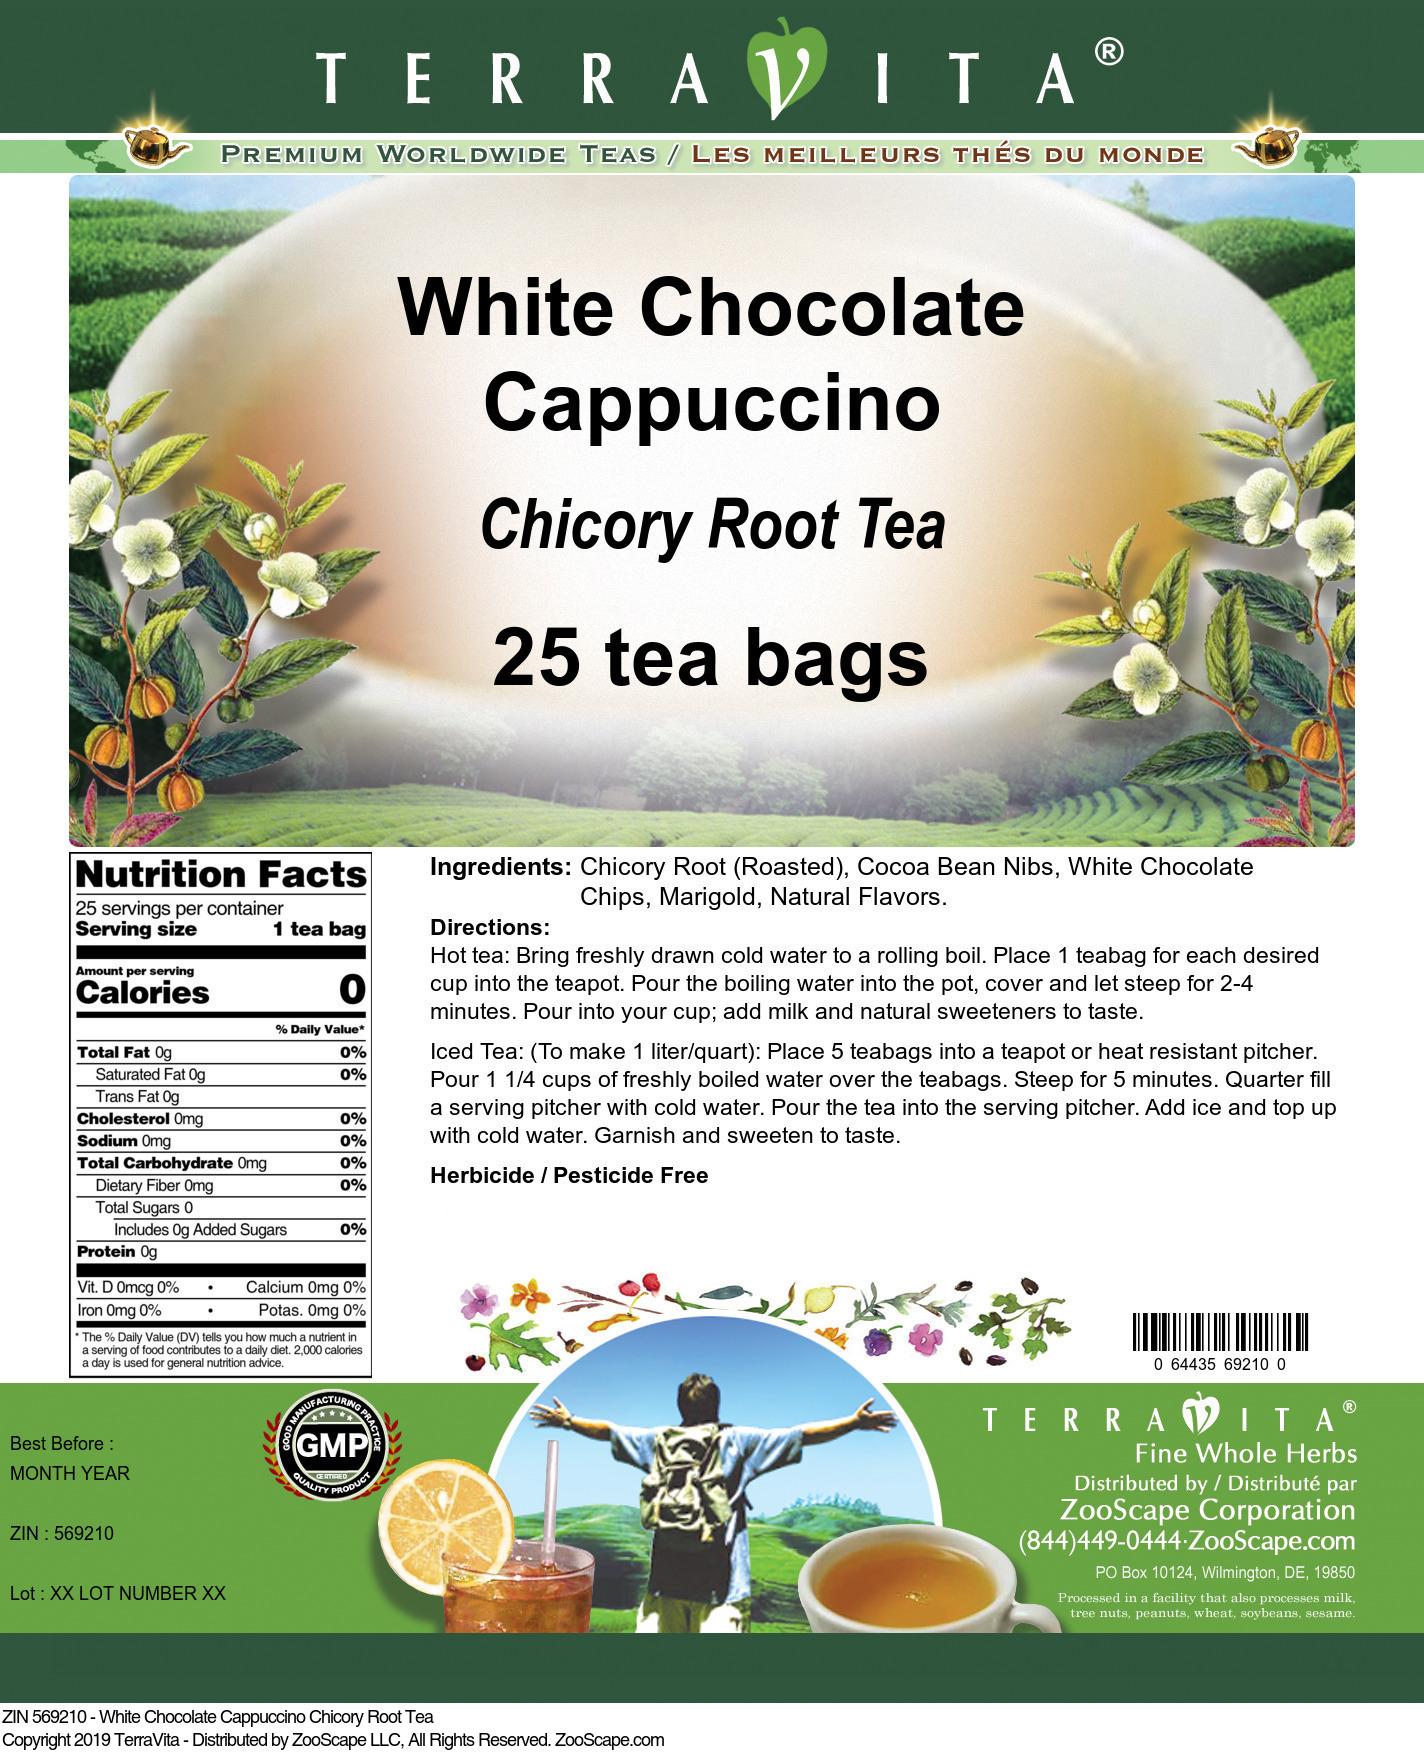 White Chocolate Cappuccino Chicory Root Tea